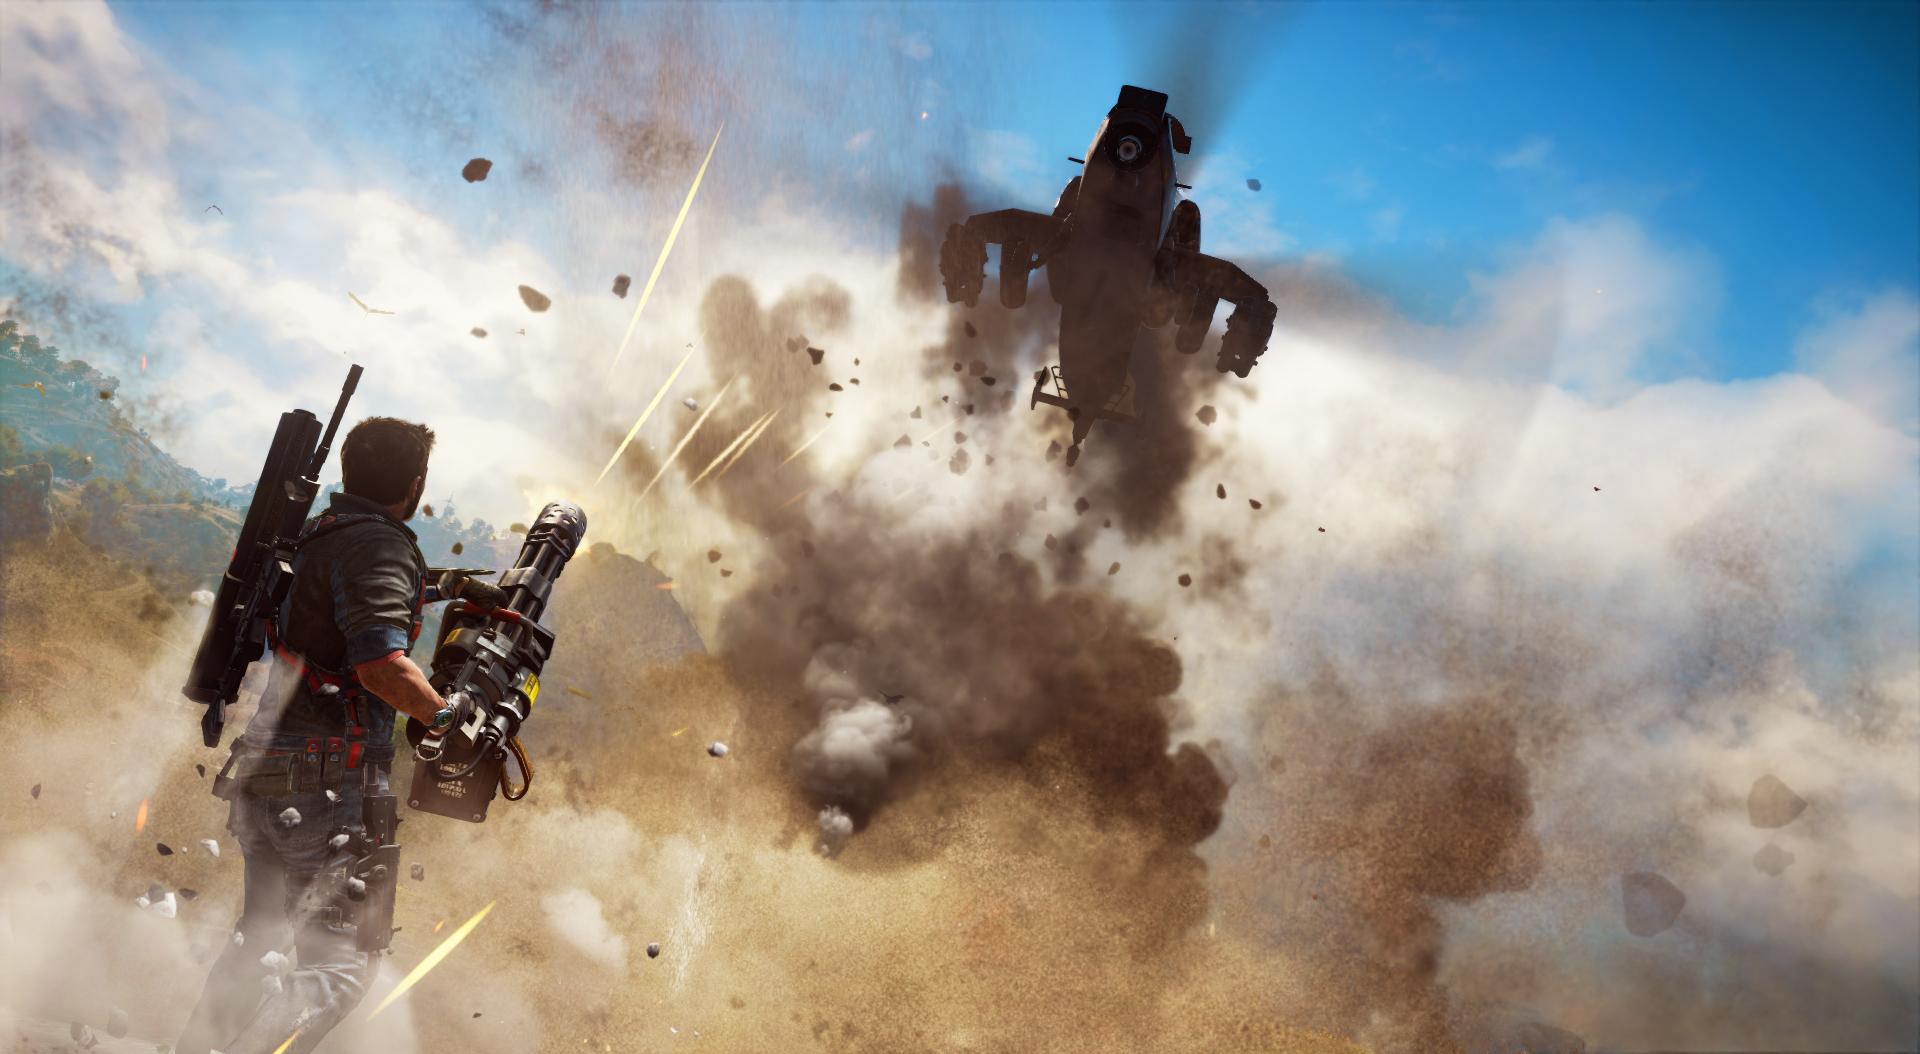 Gamescom 2015: Just Cause 3 Burn It Trailer